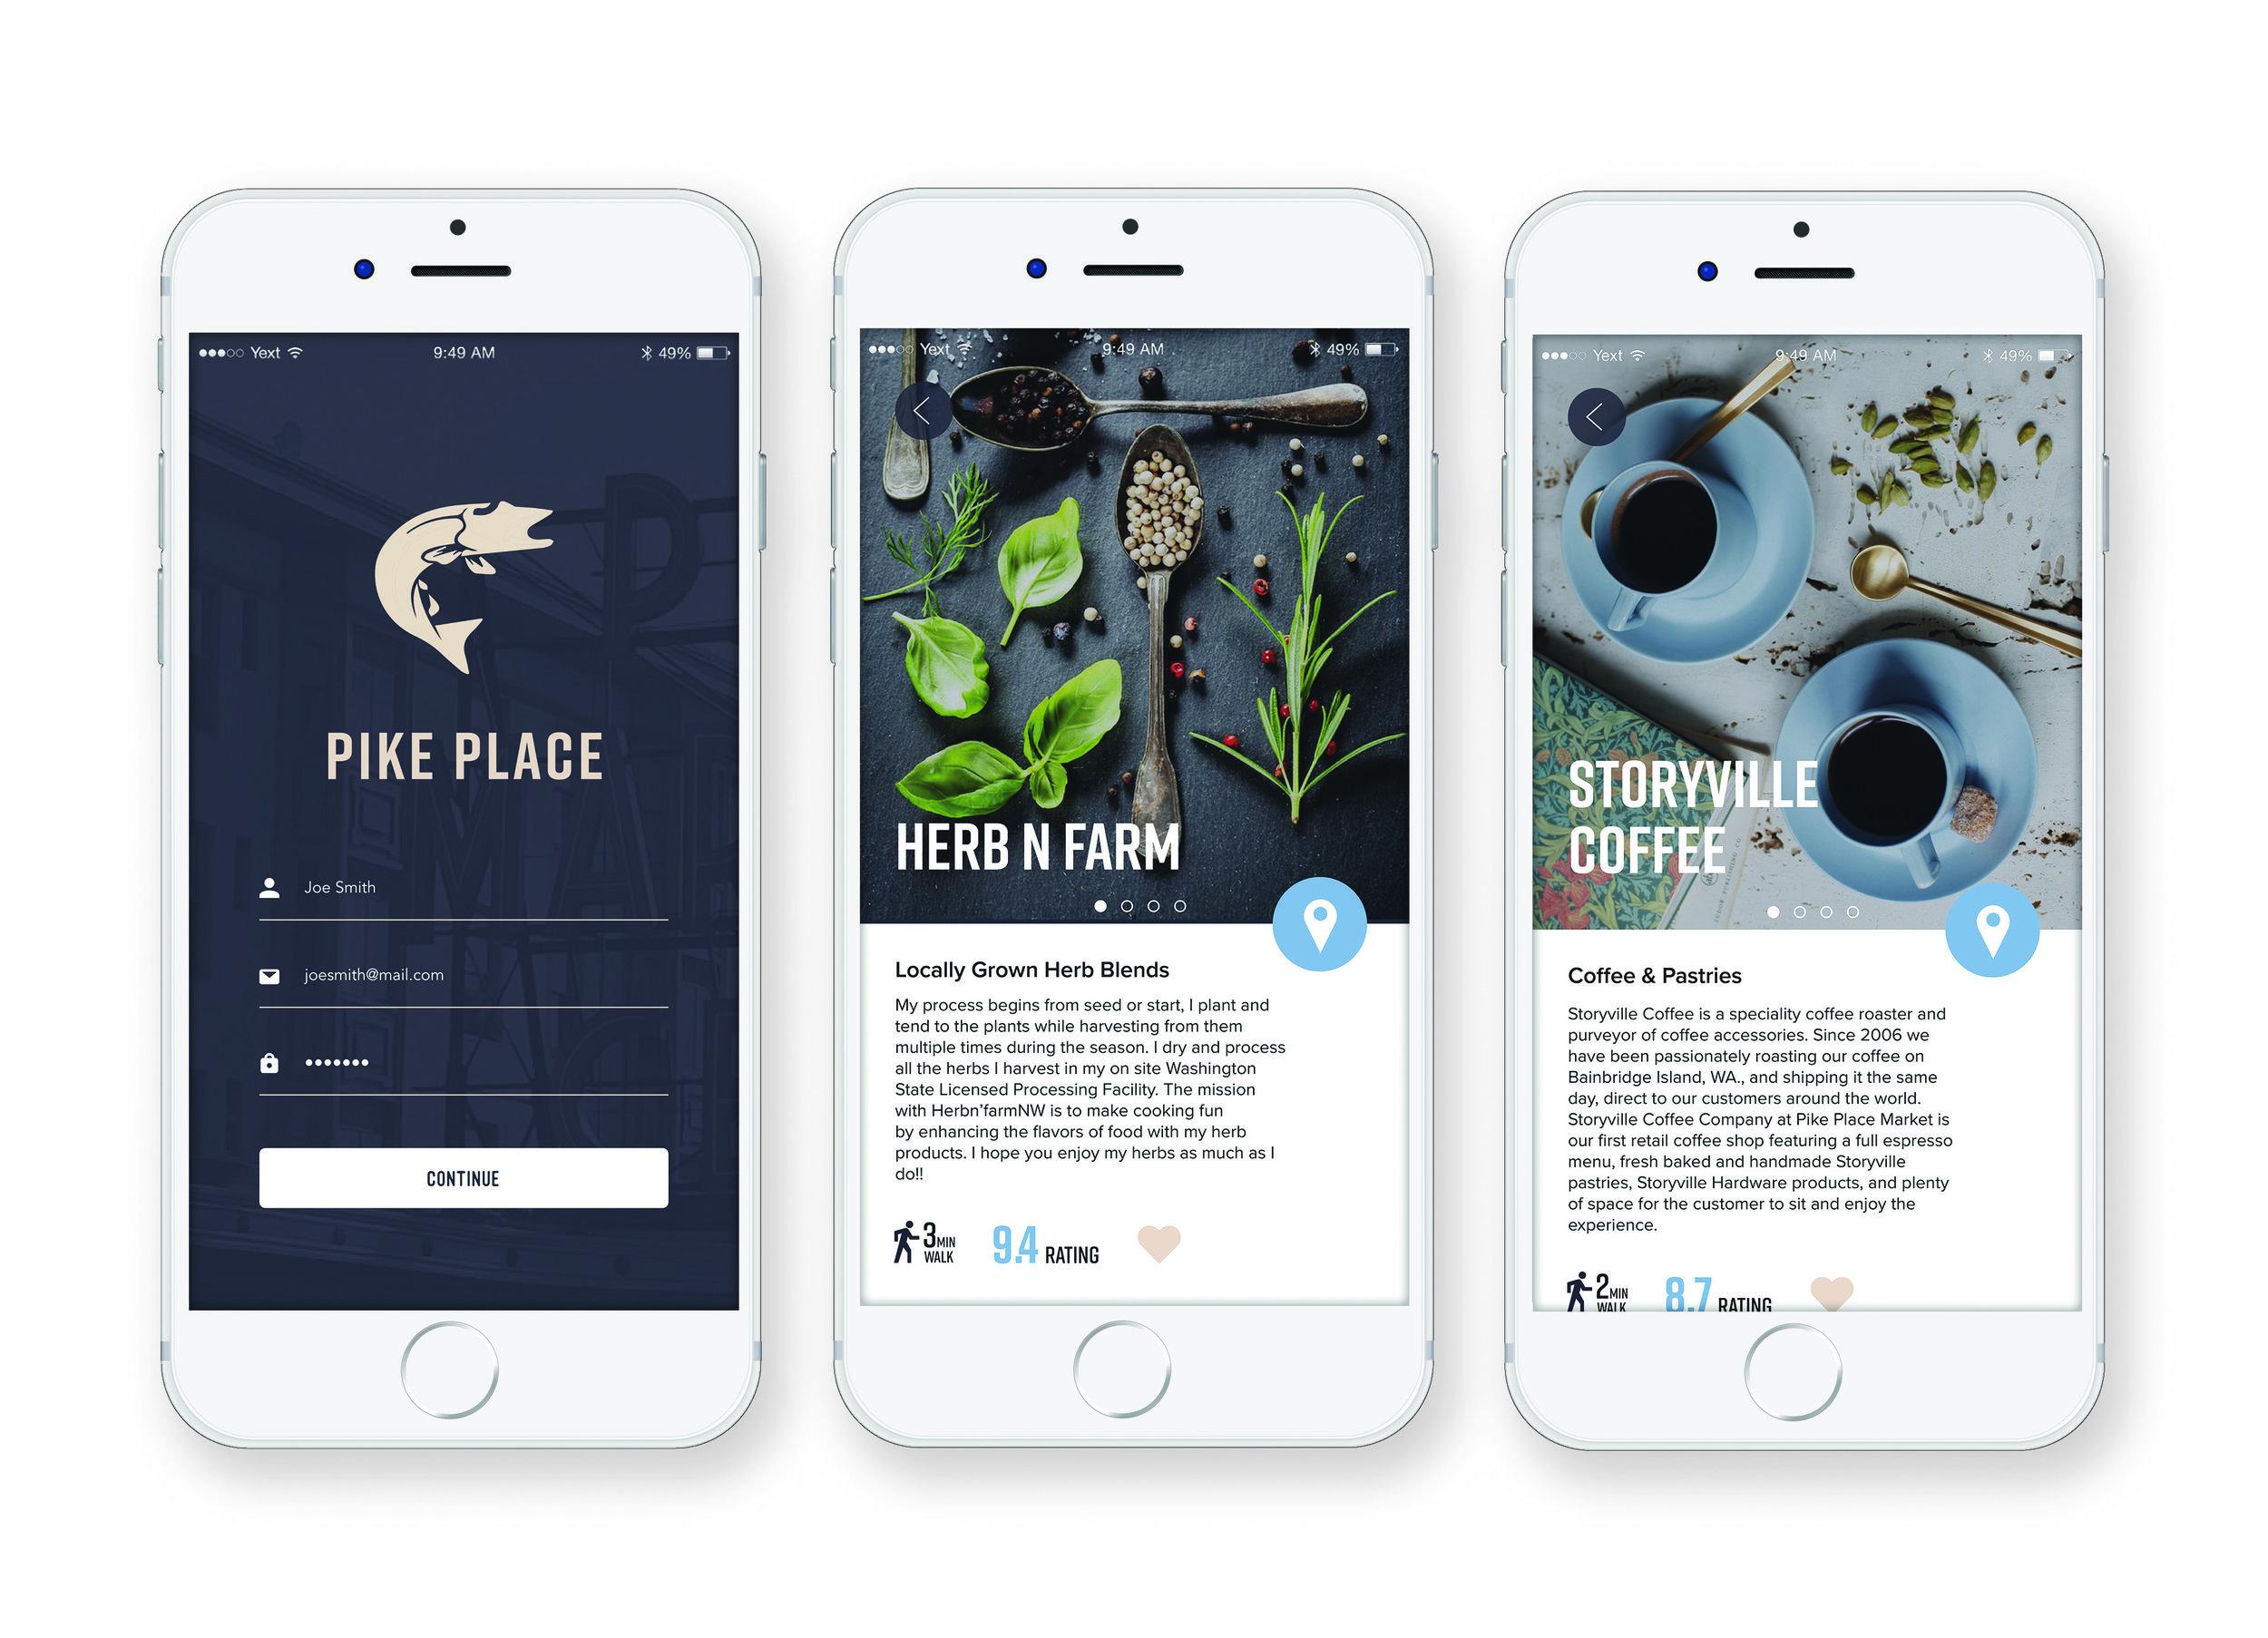 Pike Place App - Wayfinding App Design